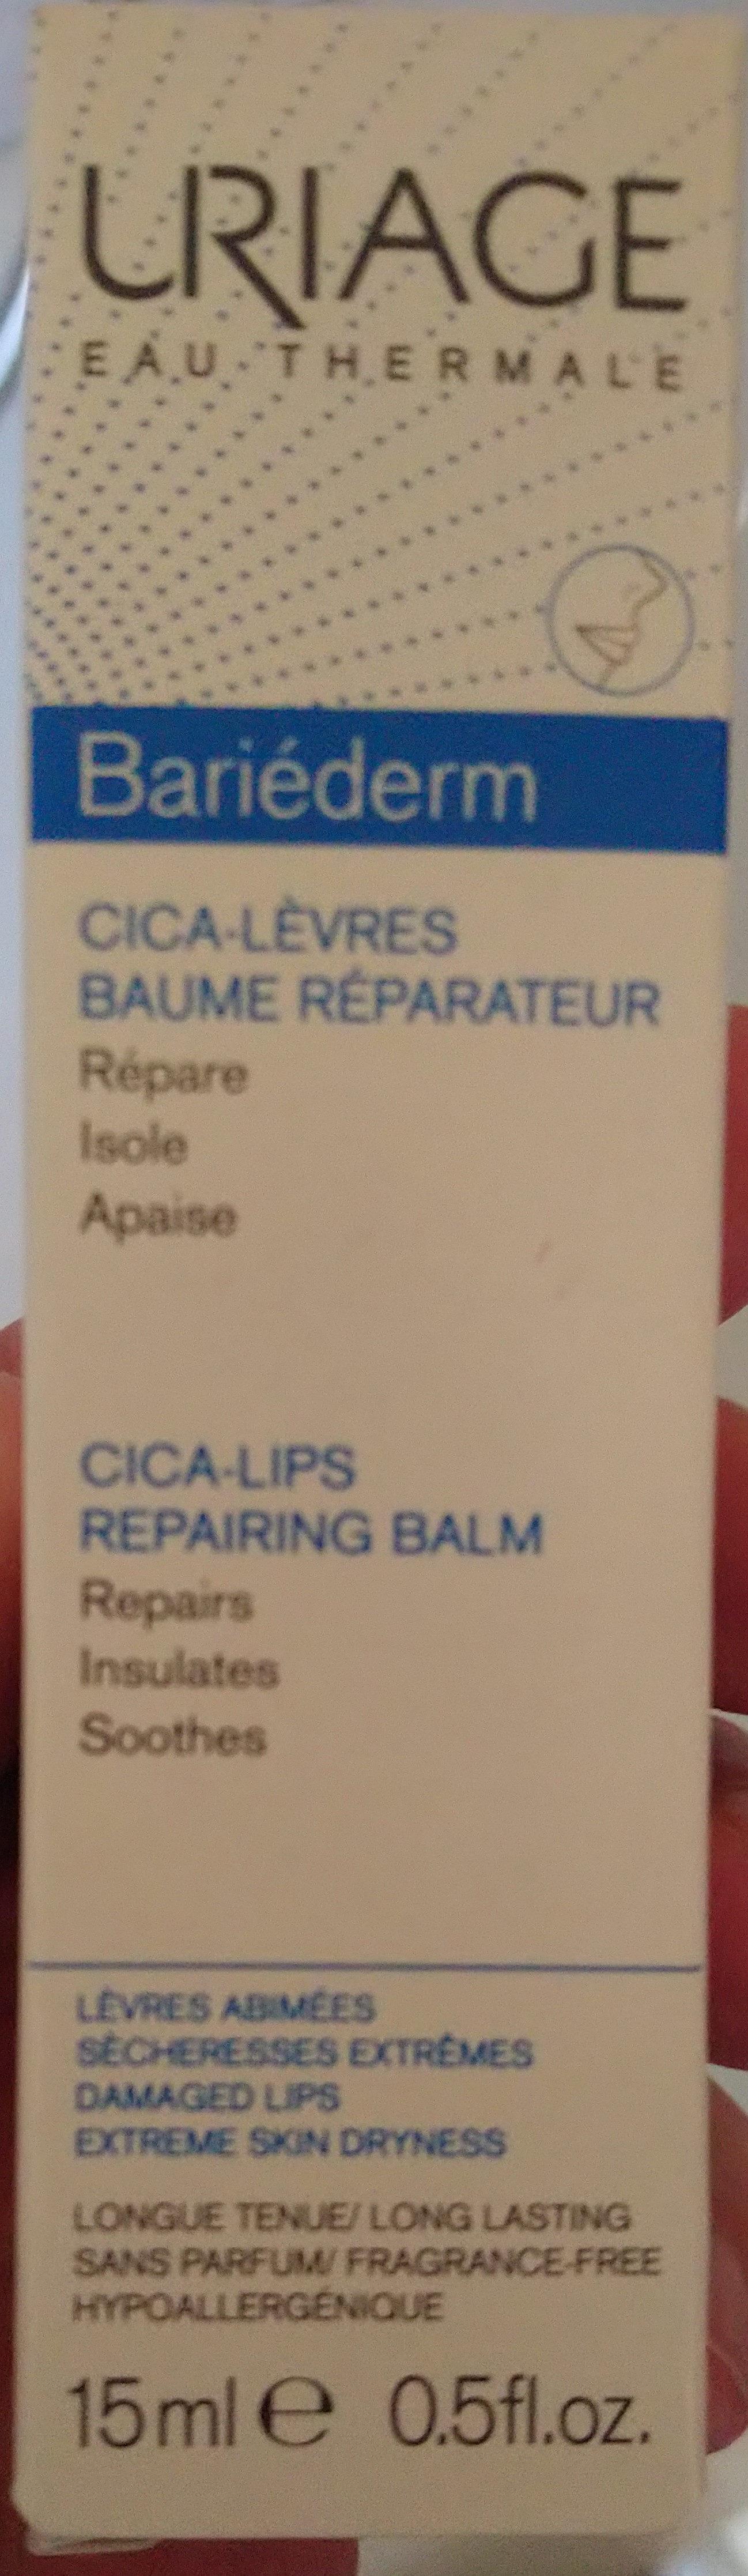 Bariéderm Cica-Lips Repairing Balm - Produit - sl